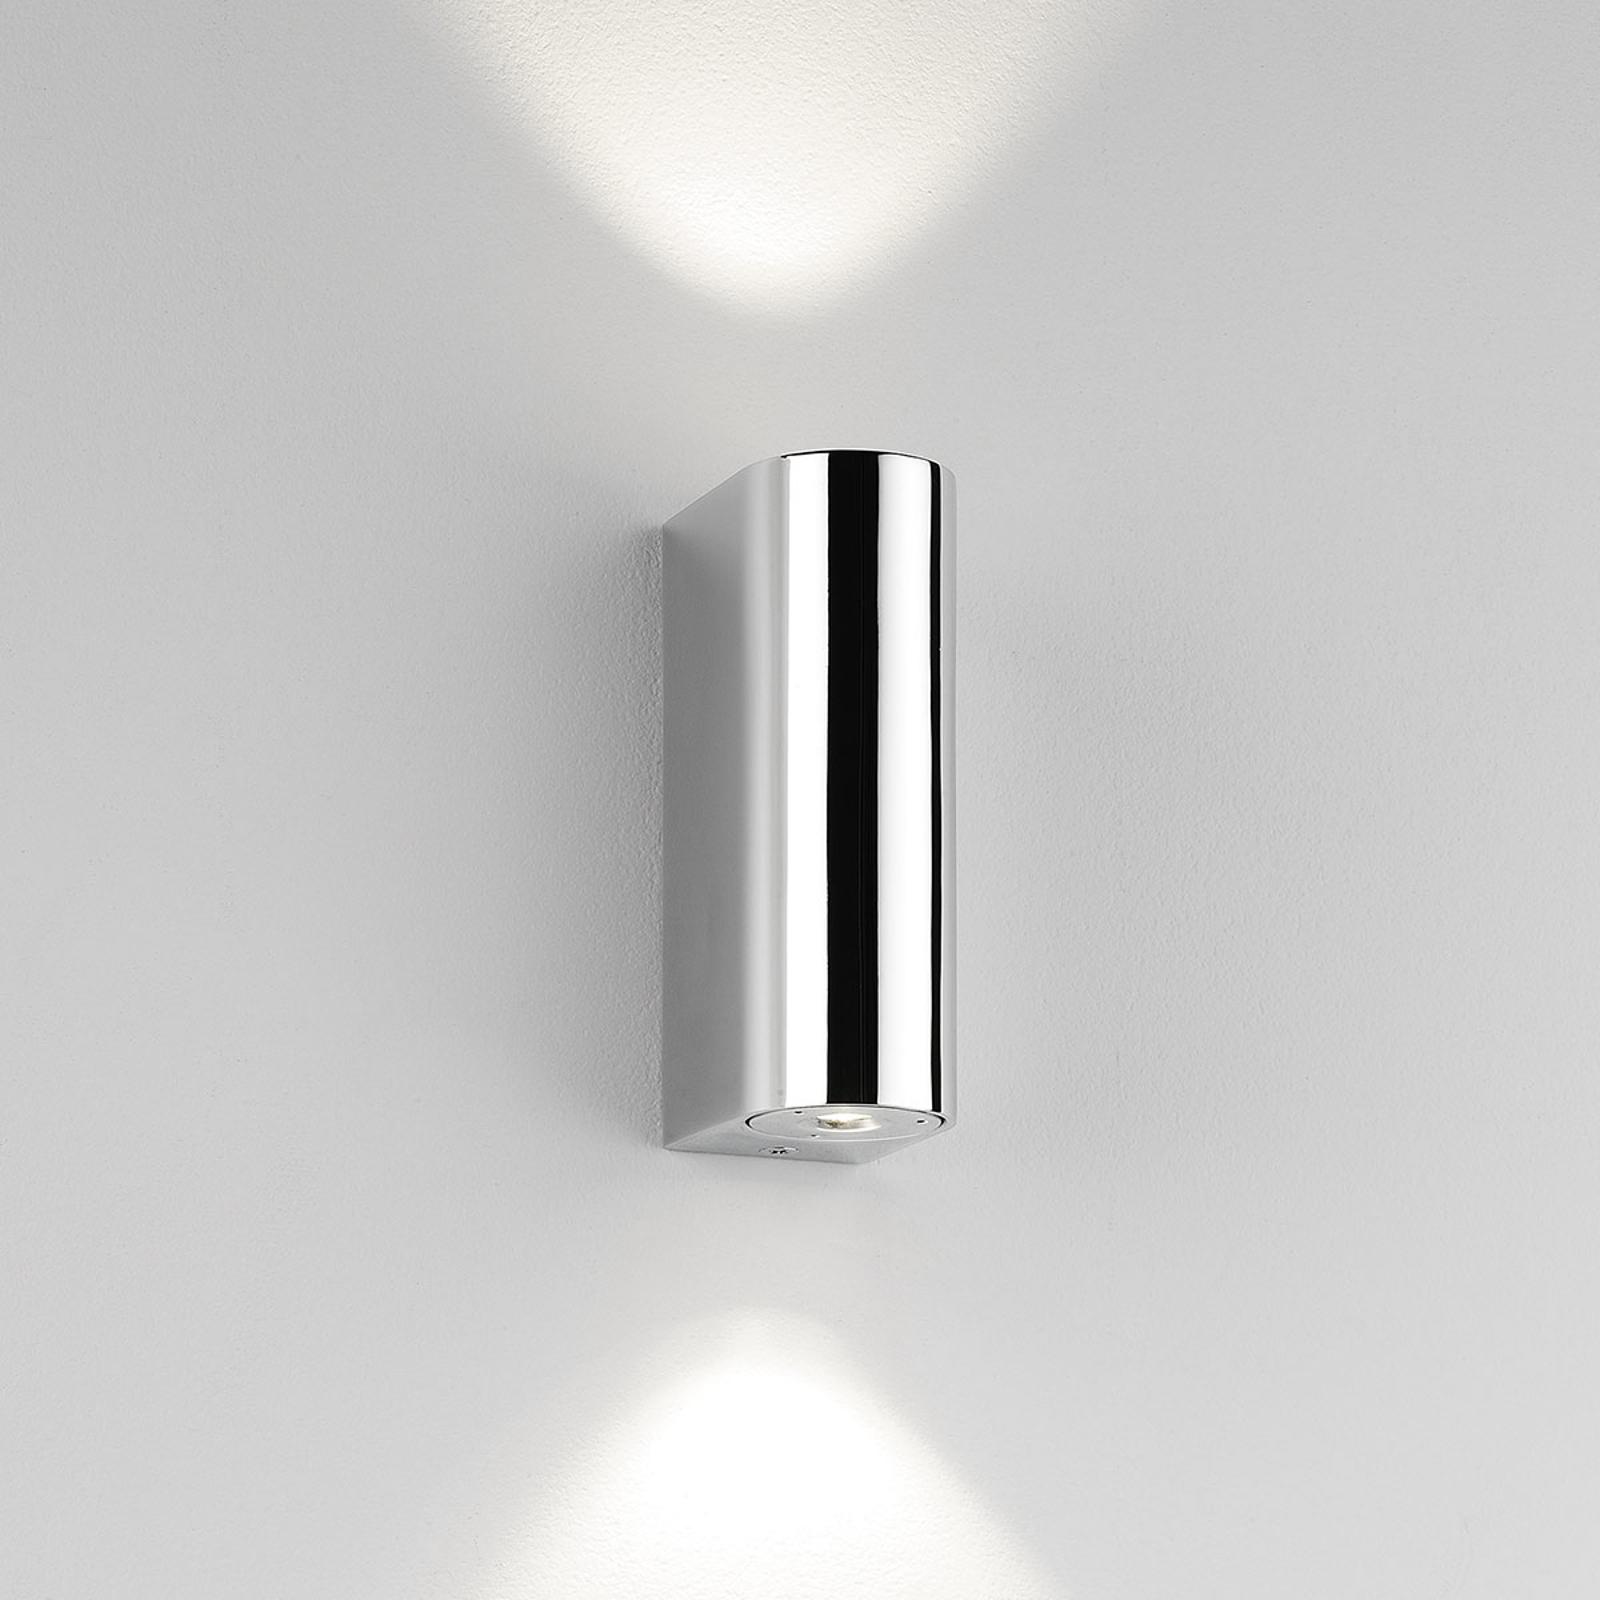 Nowoczesna  lampa ścienna LED Alba